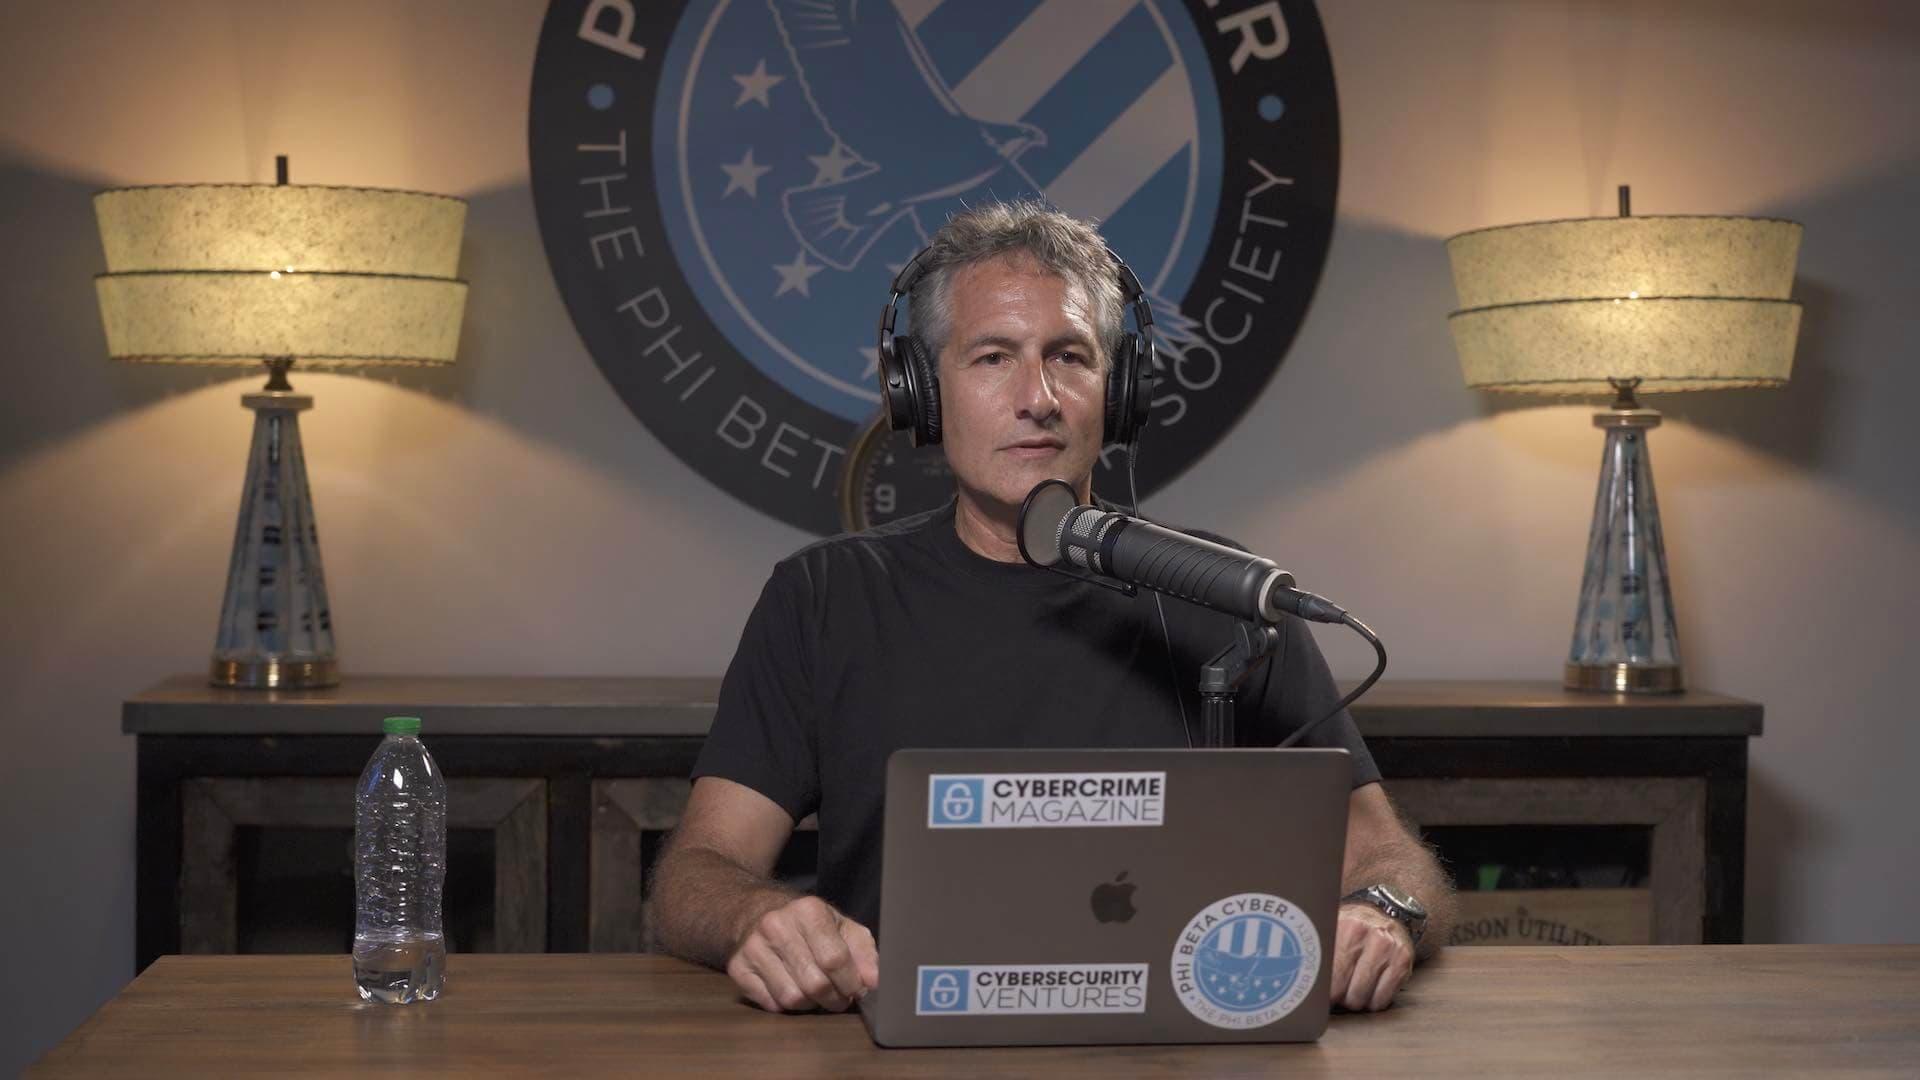 Cybercrime Radio presenter Steve Morgan.